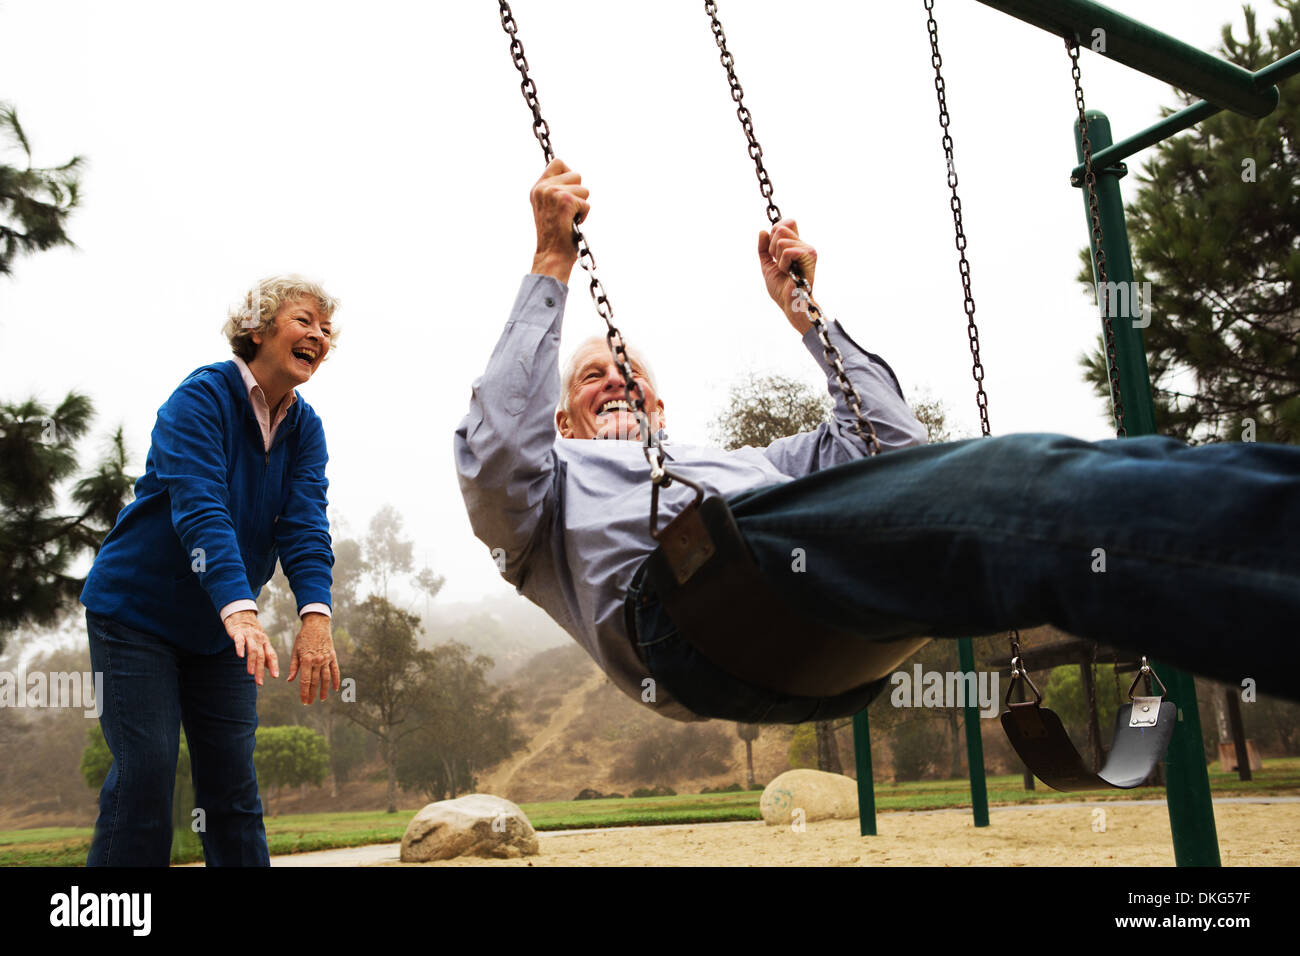 Femme poussant mari on swing Photo Stock